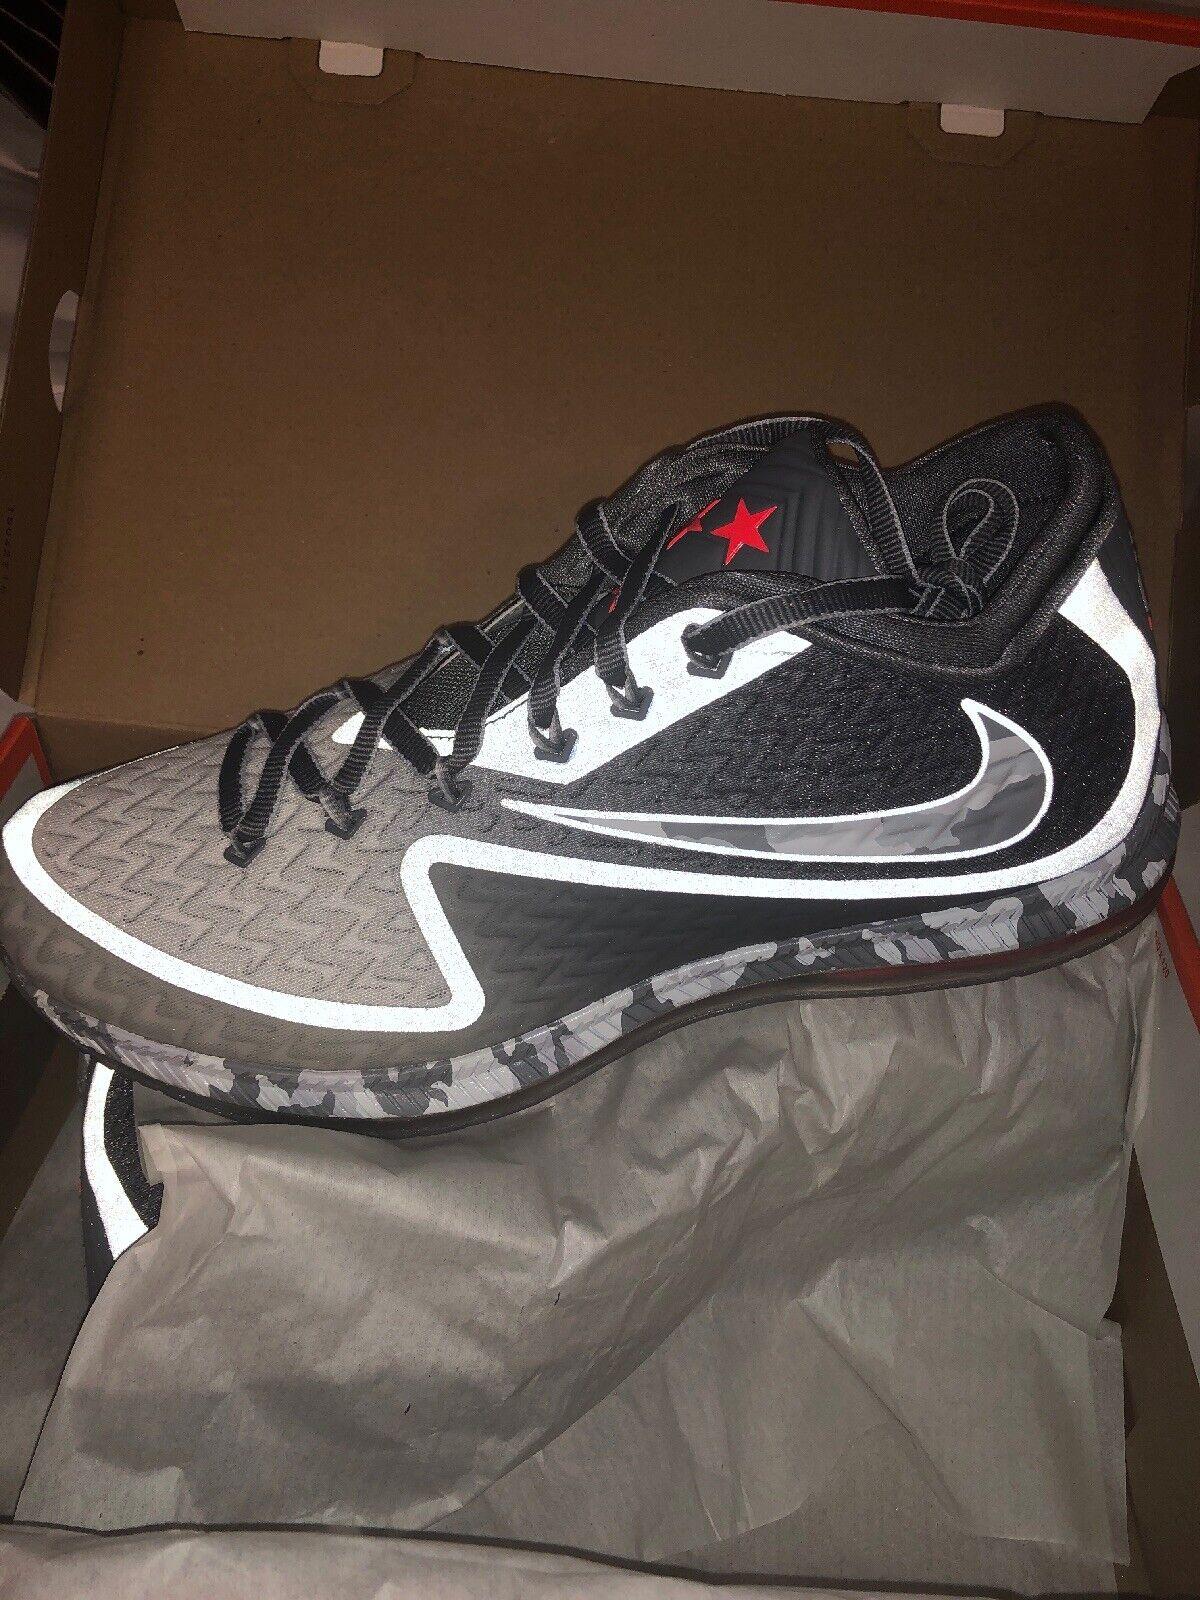 Nike Field General 2 Grey Platinum Camo Football Size 12